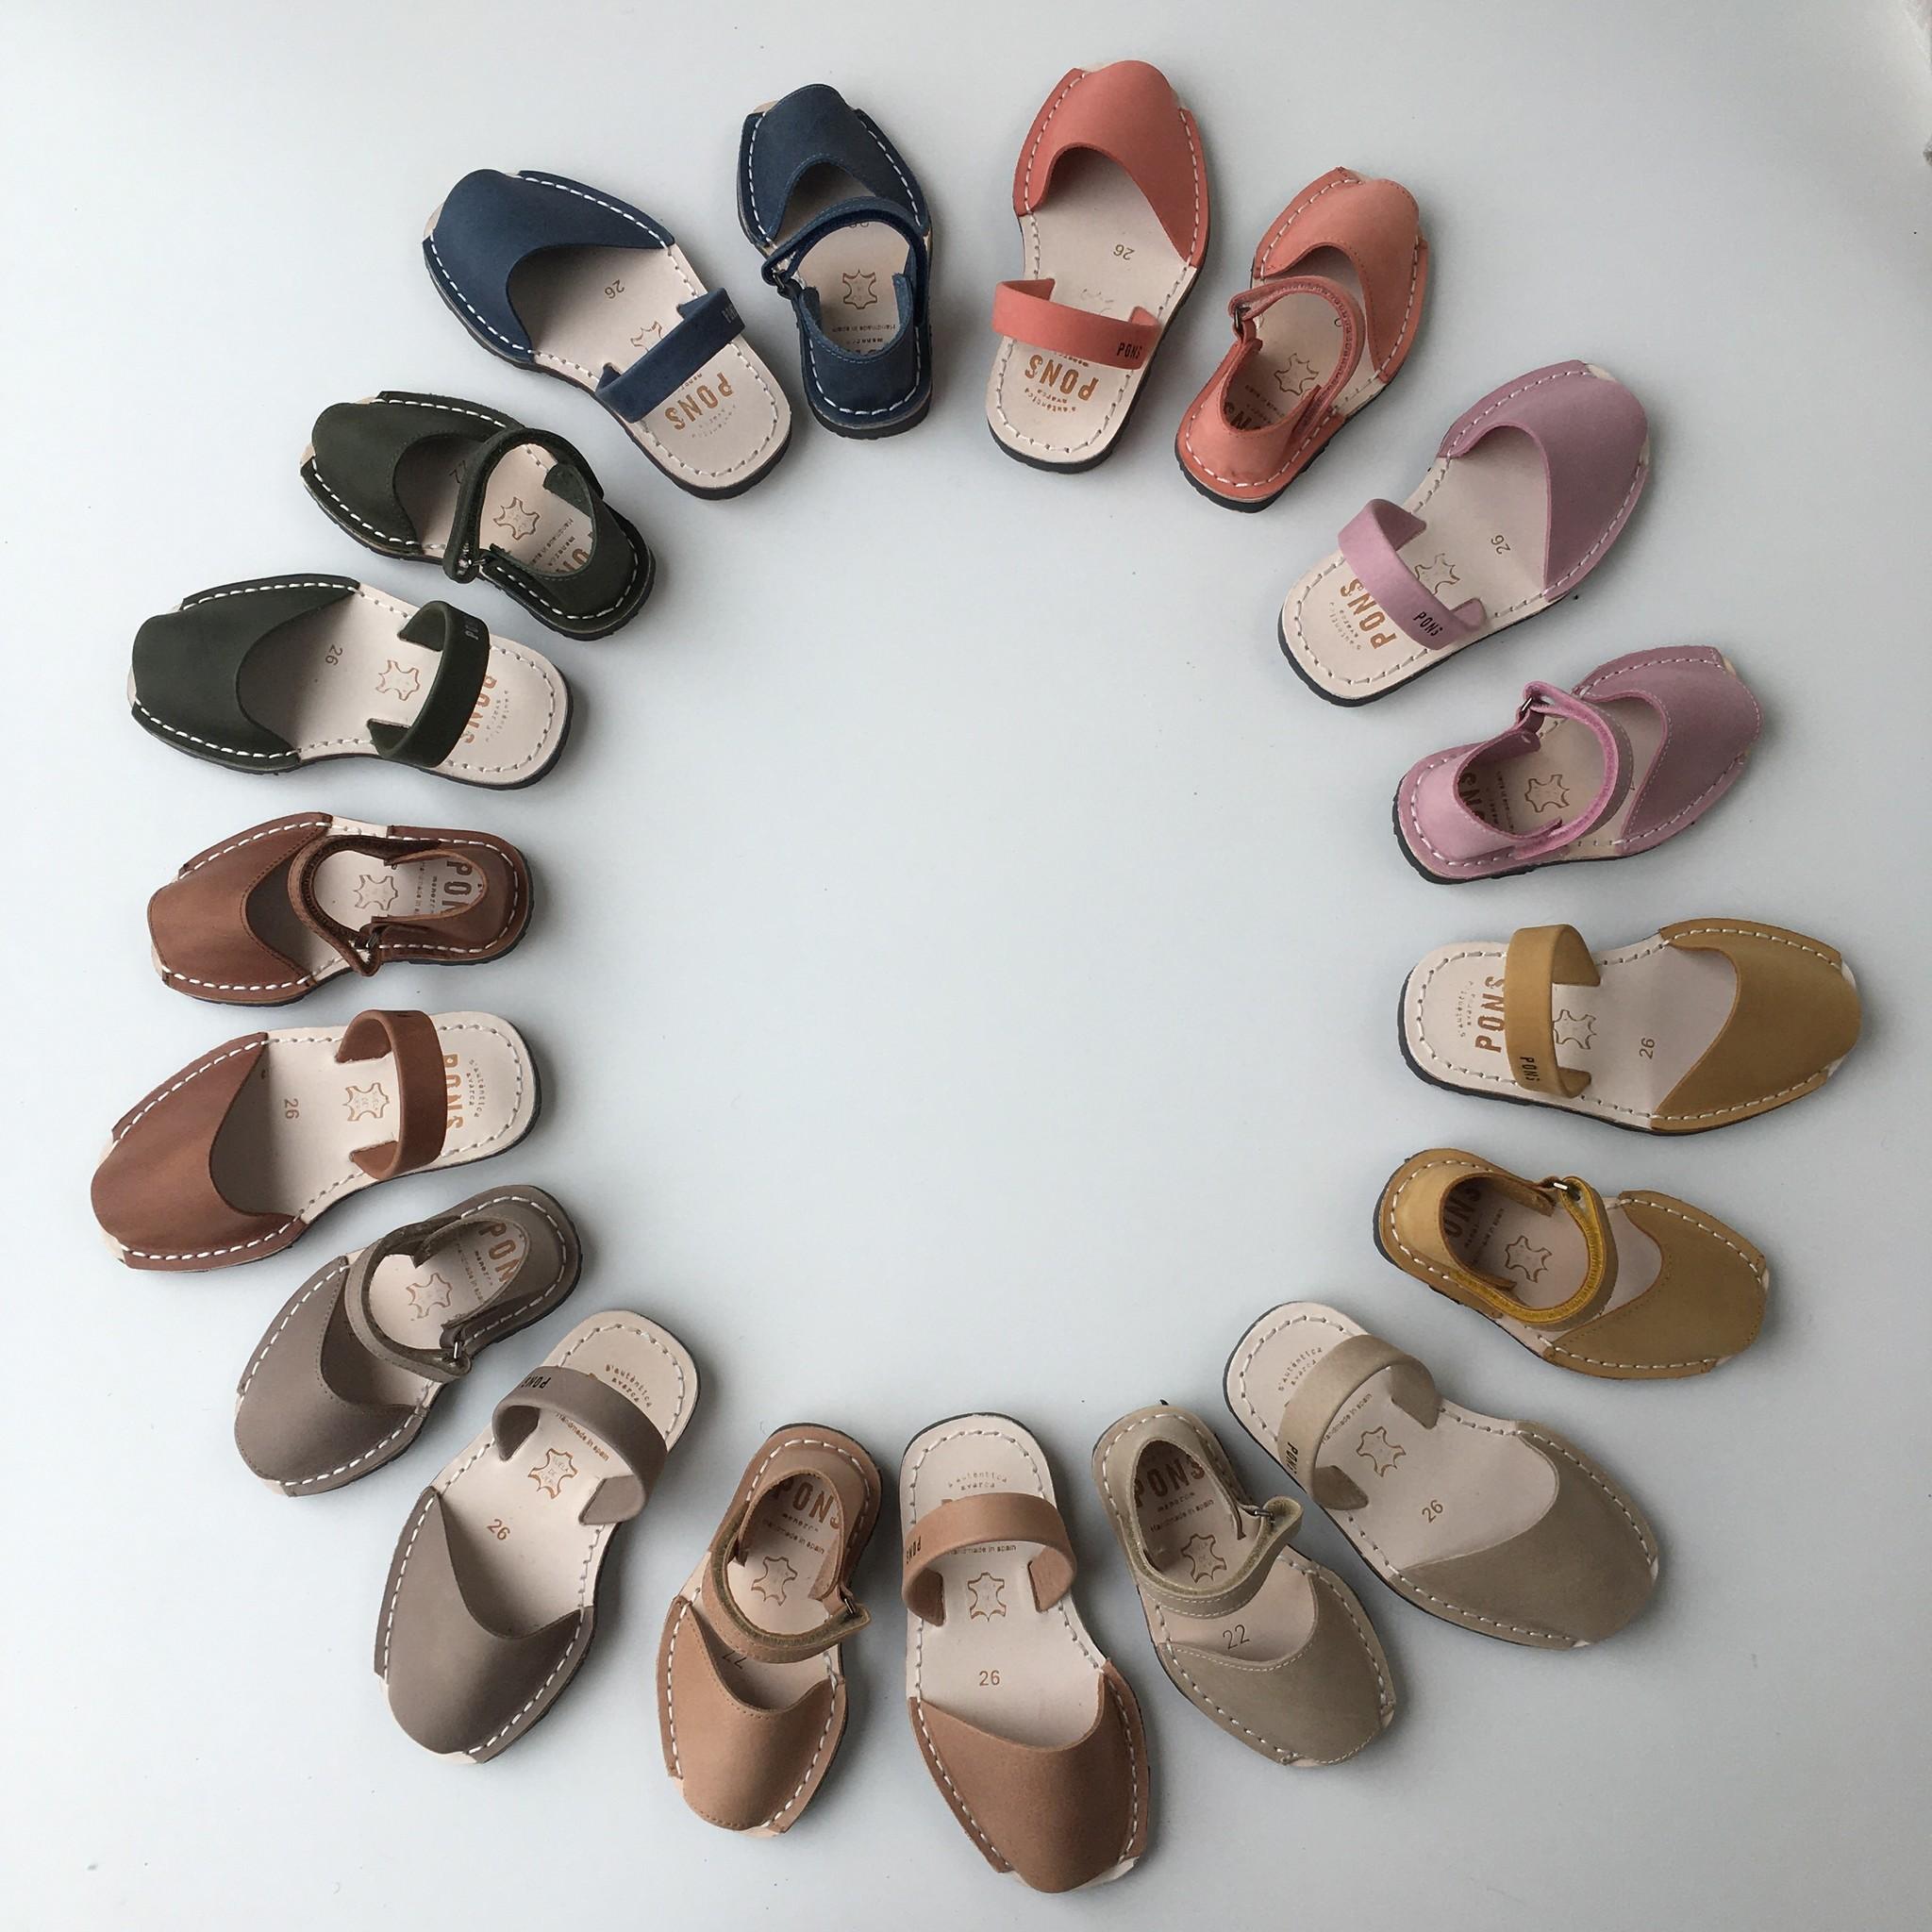 Pons  nubuck leather avarca sandal child BOSQUE - mustard yellow - 22 to 25